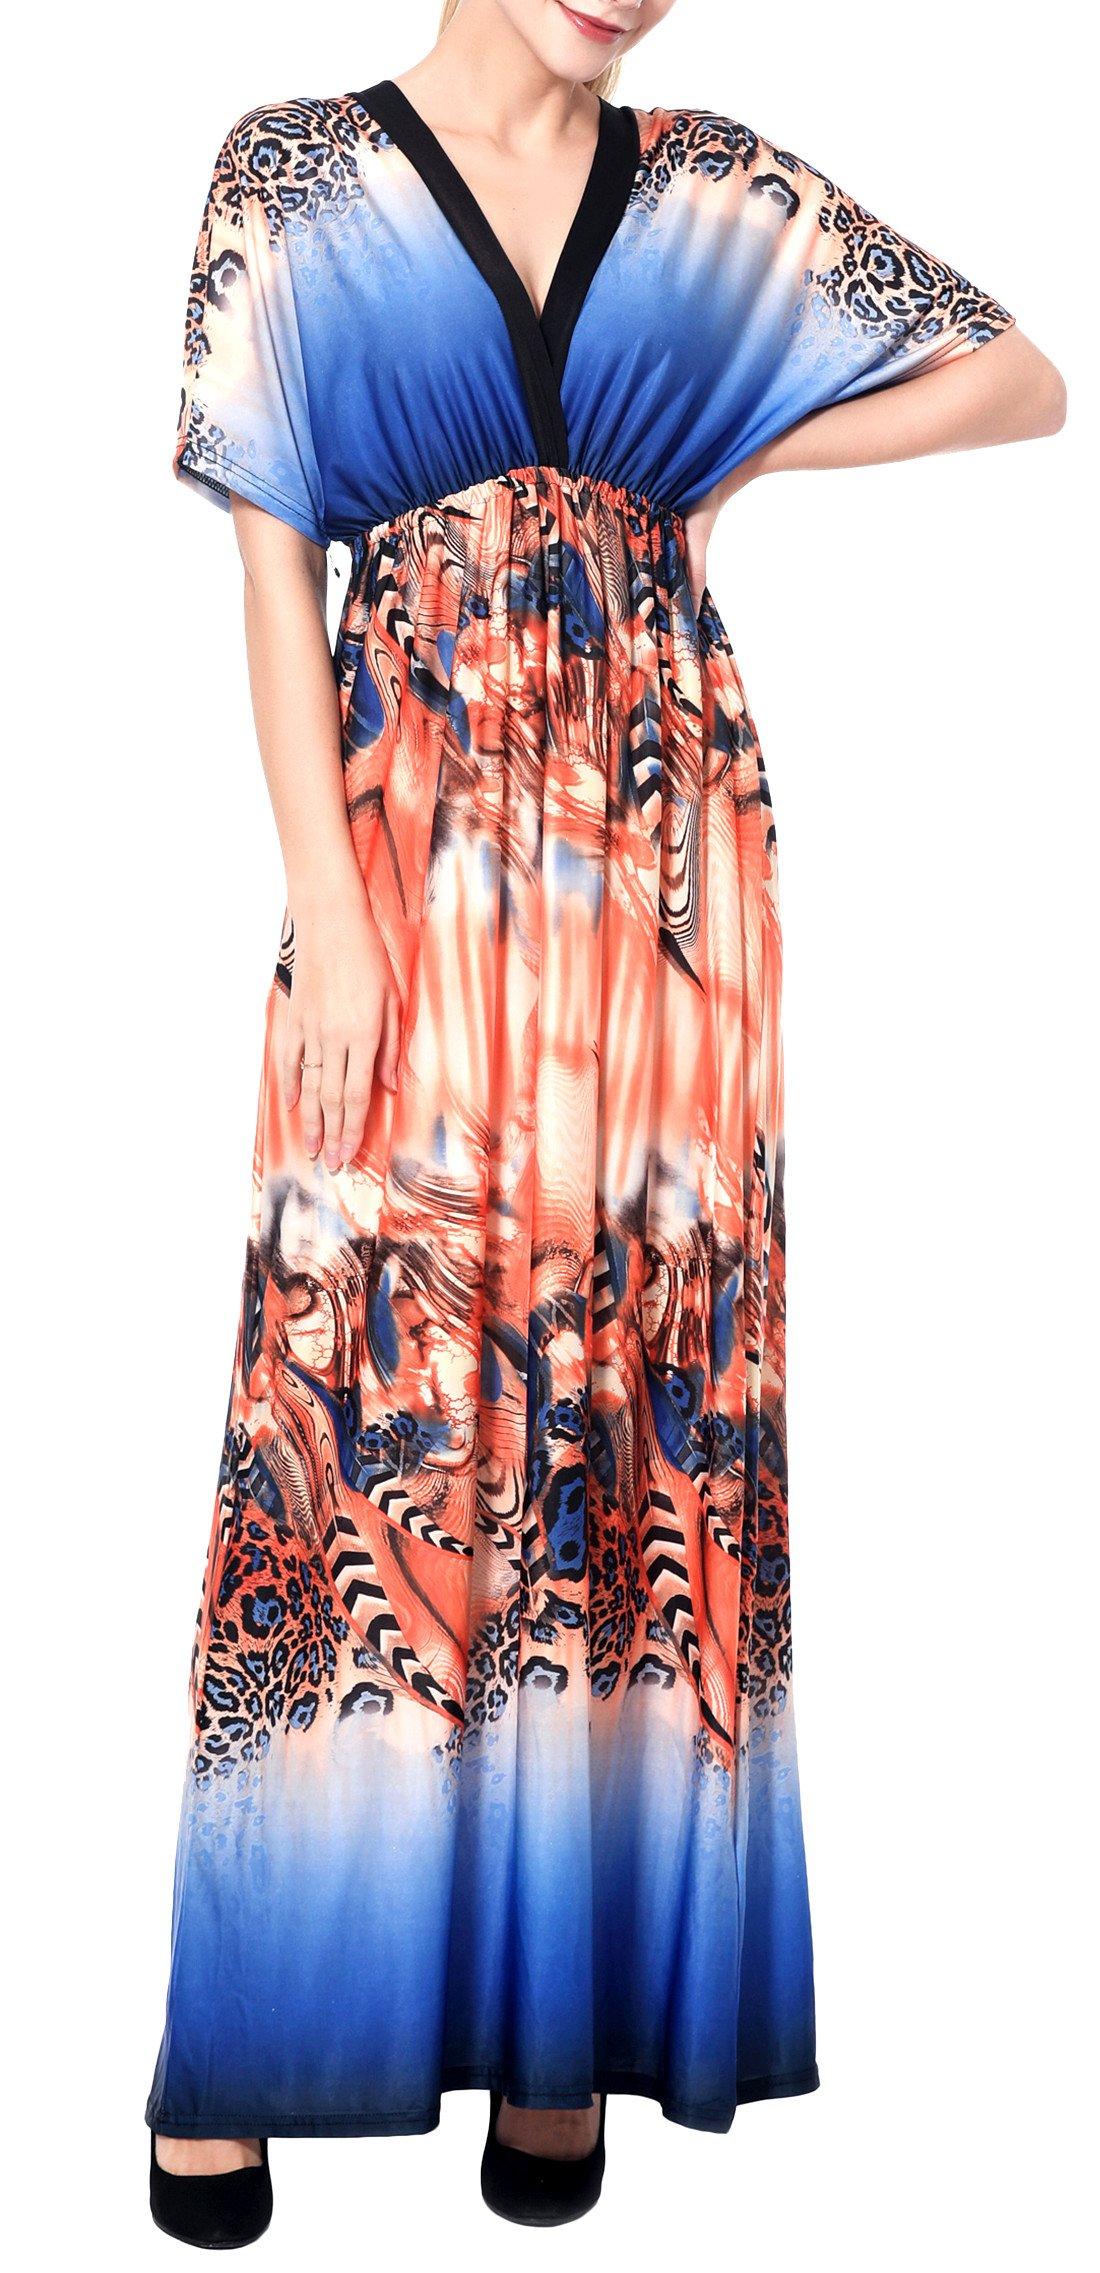 Wantdo Women's Deep V-Neck Maxi Dress Boho Style Backless Full Length Dresses Plus Size Sapphire Blue 3XL